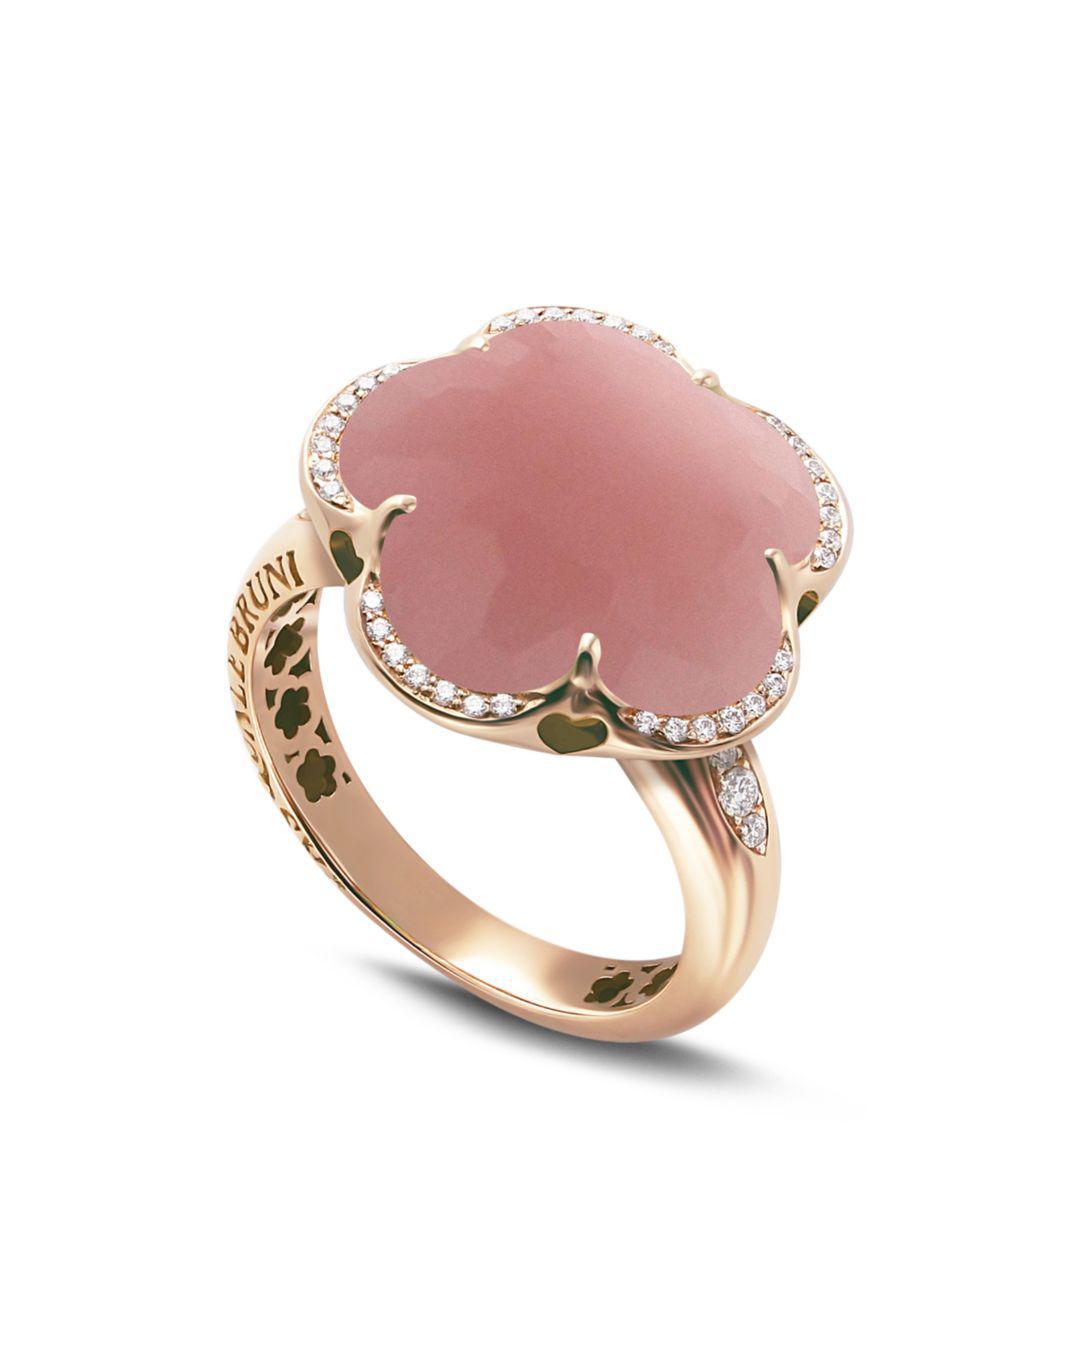 Lyst - Pasquale Bruni 18k Rose Gold Bon Ton Floral Dark Pink ...